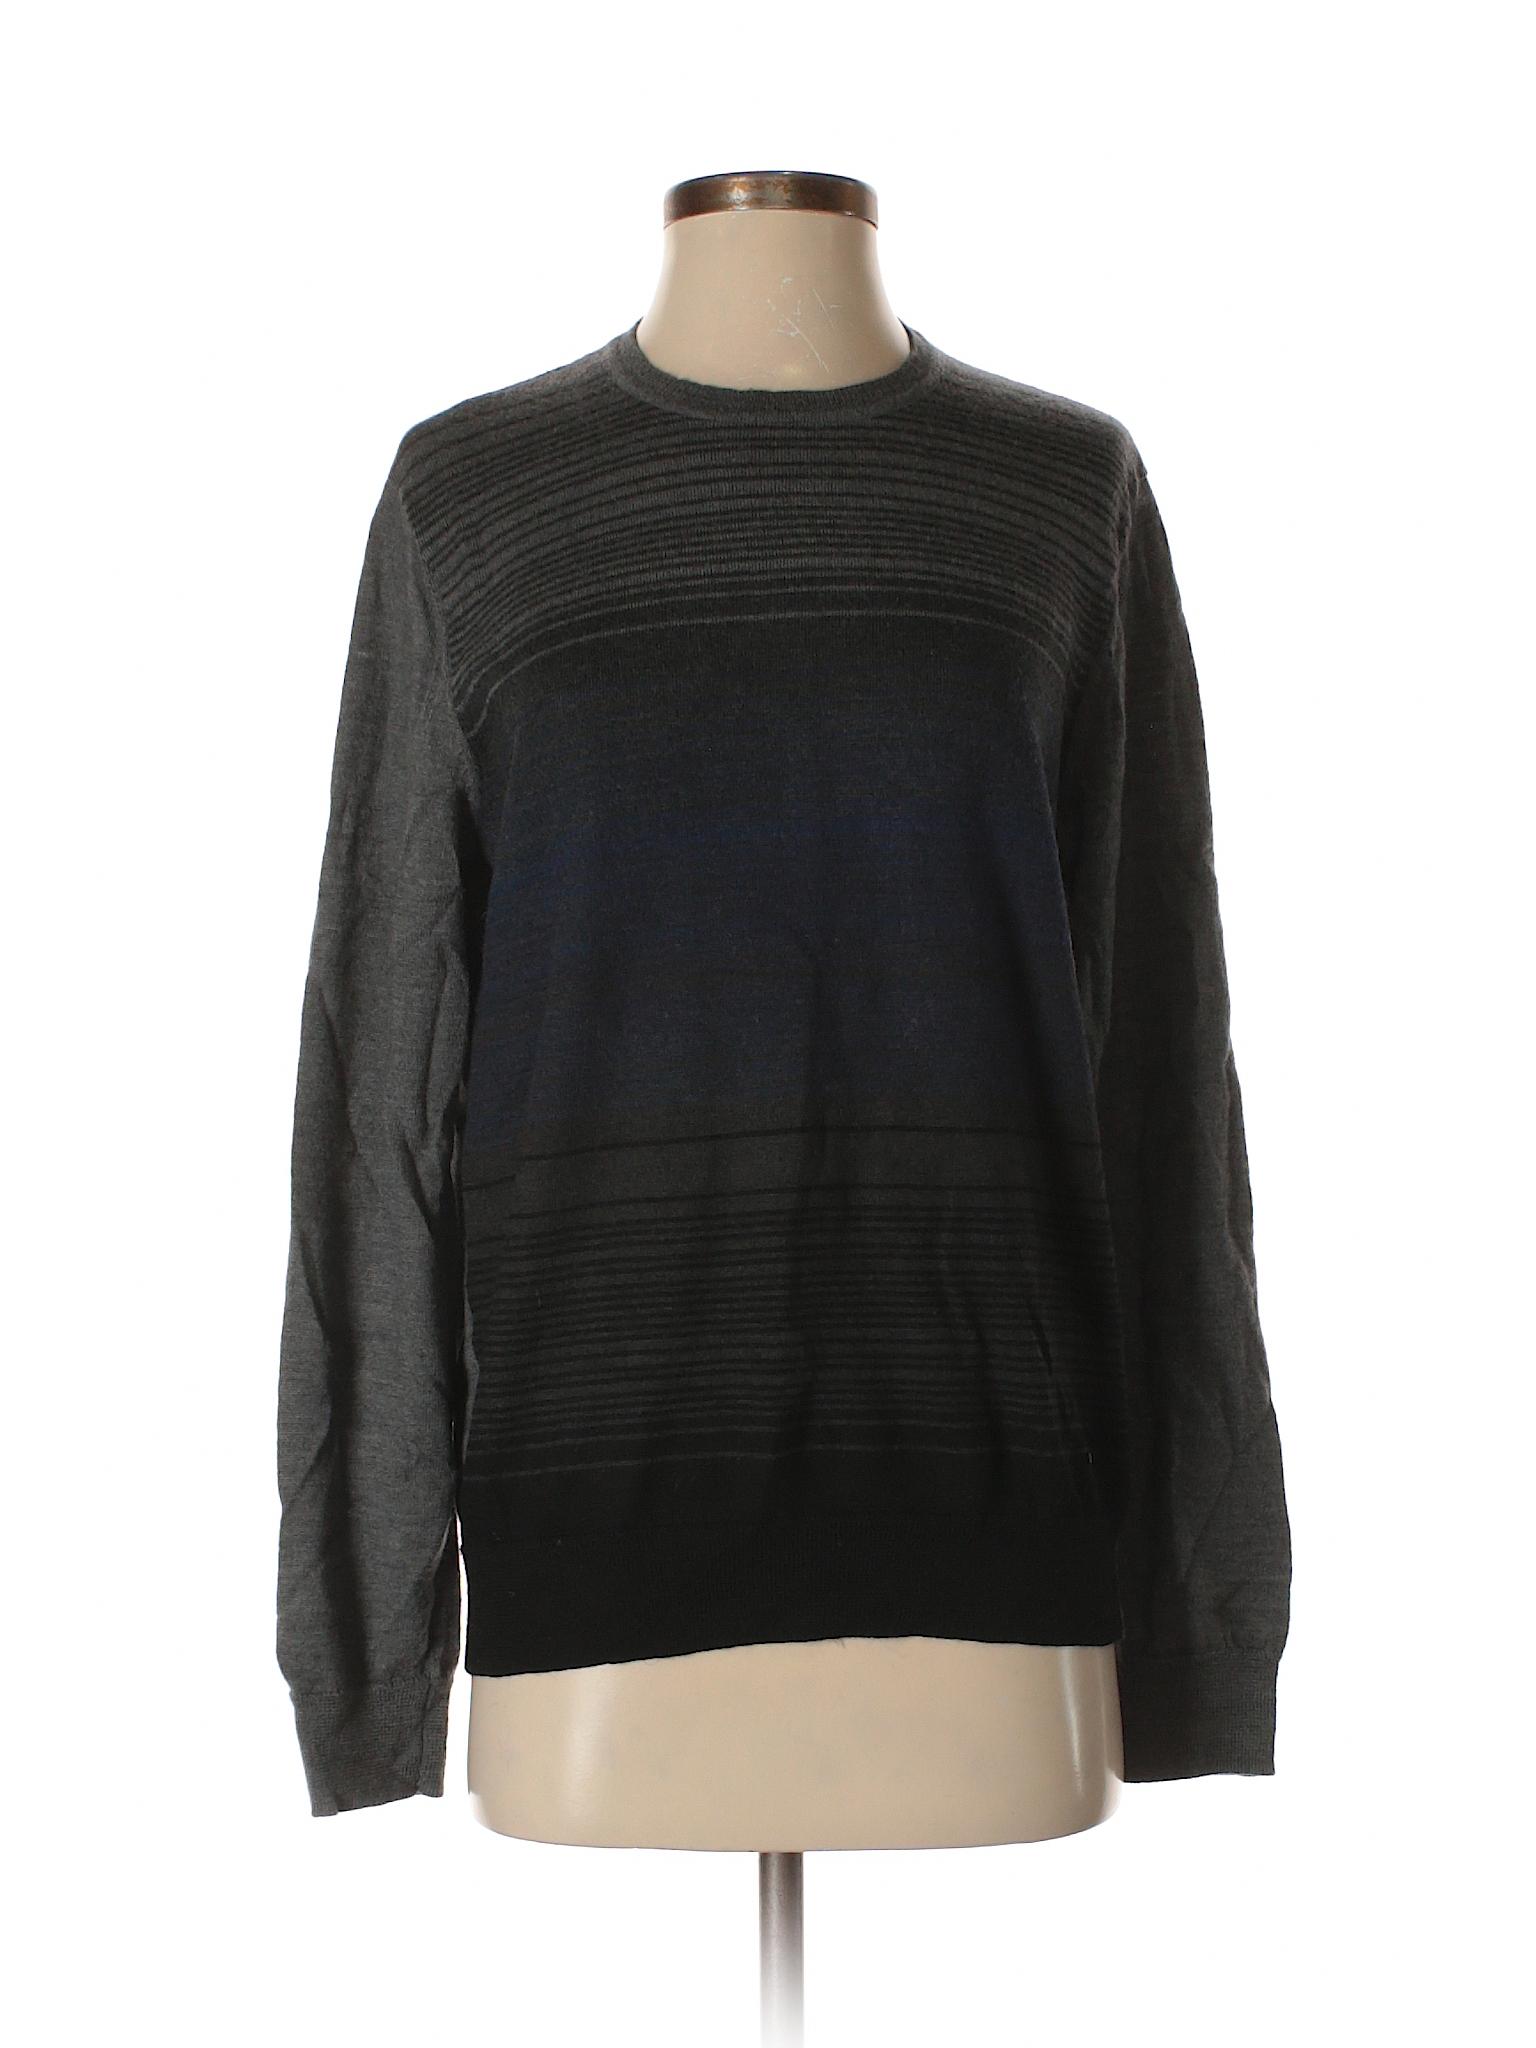 Pullover Sweater Calvin Klein Boutique Wool wTxPqIIO